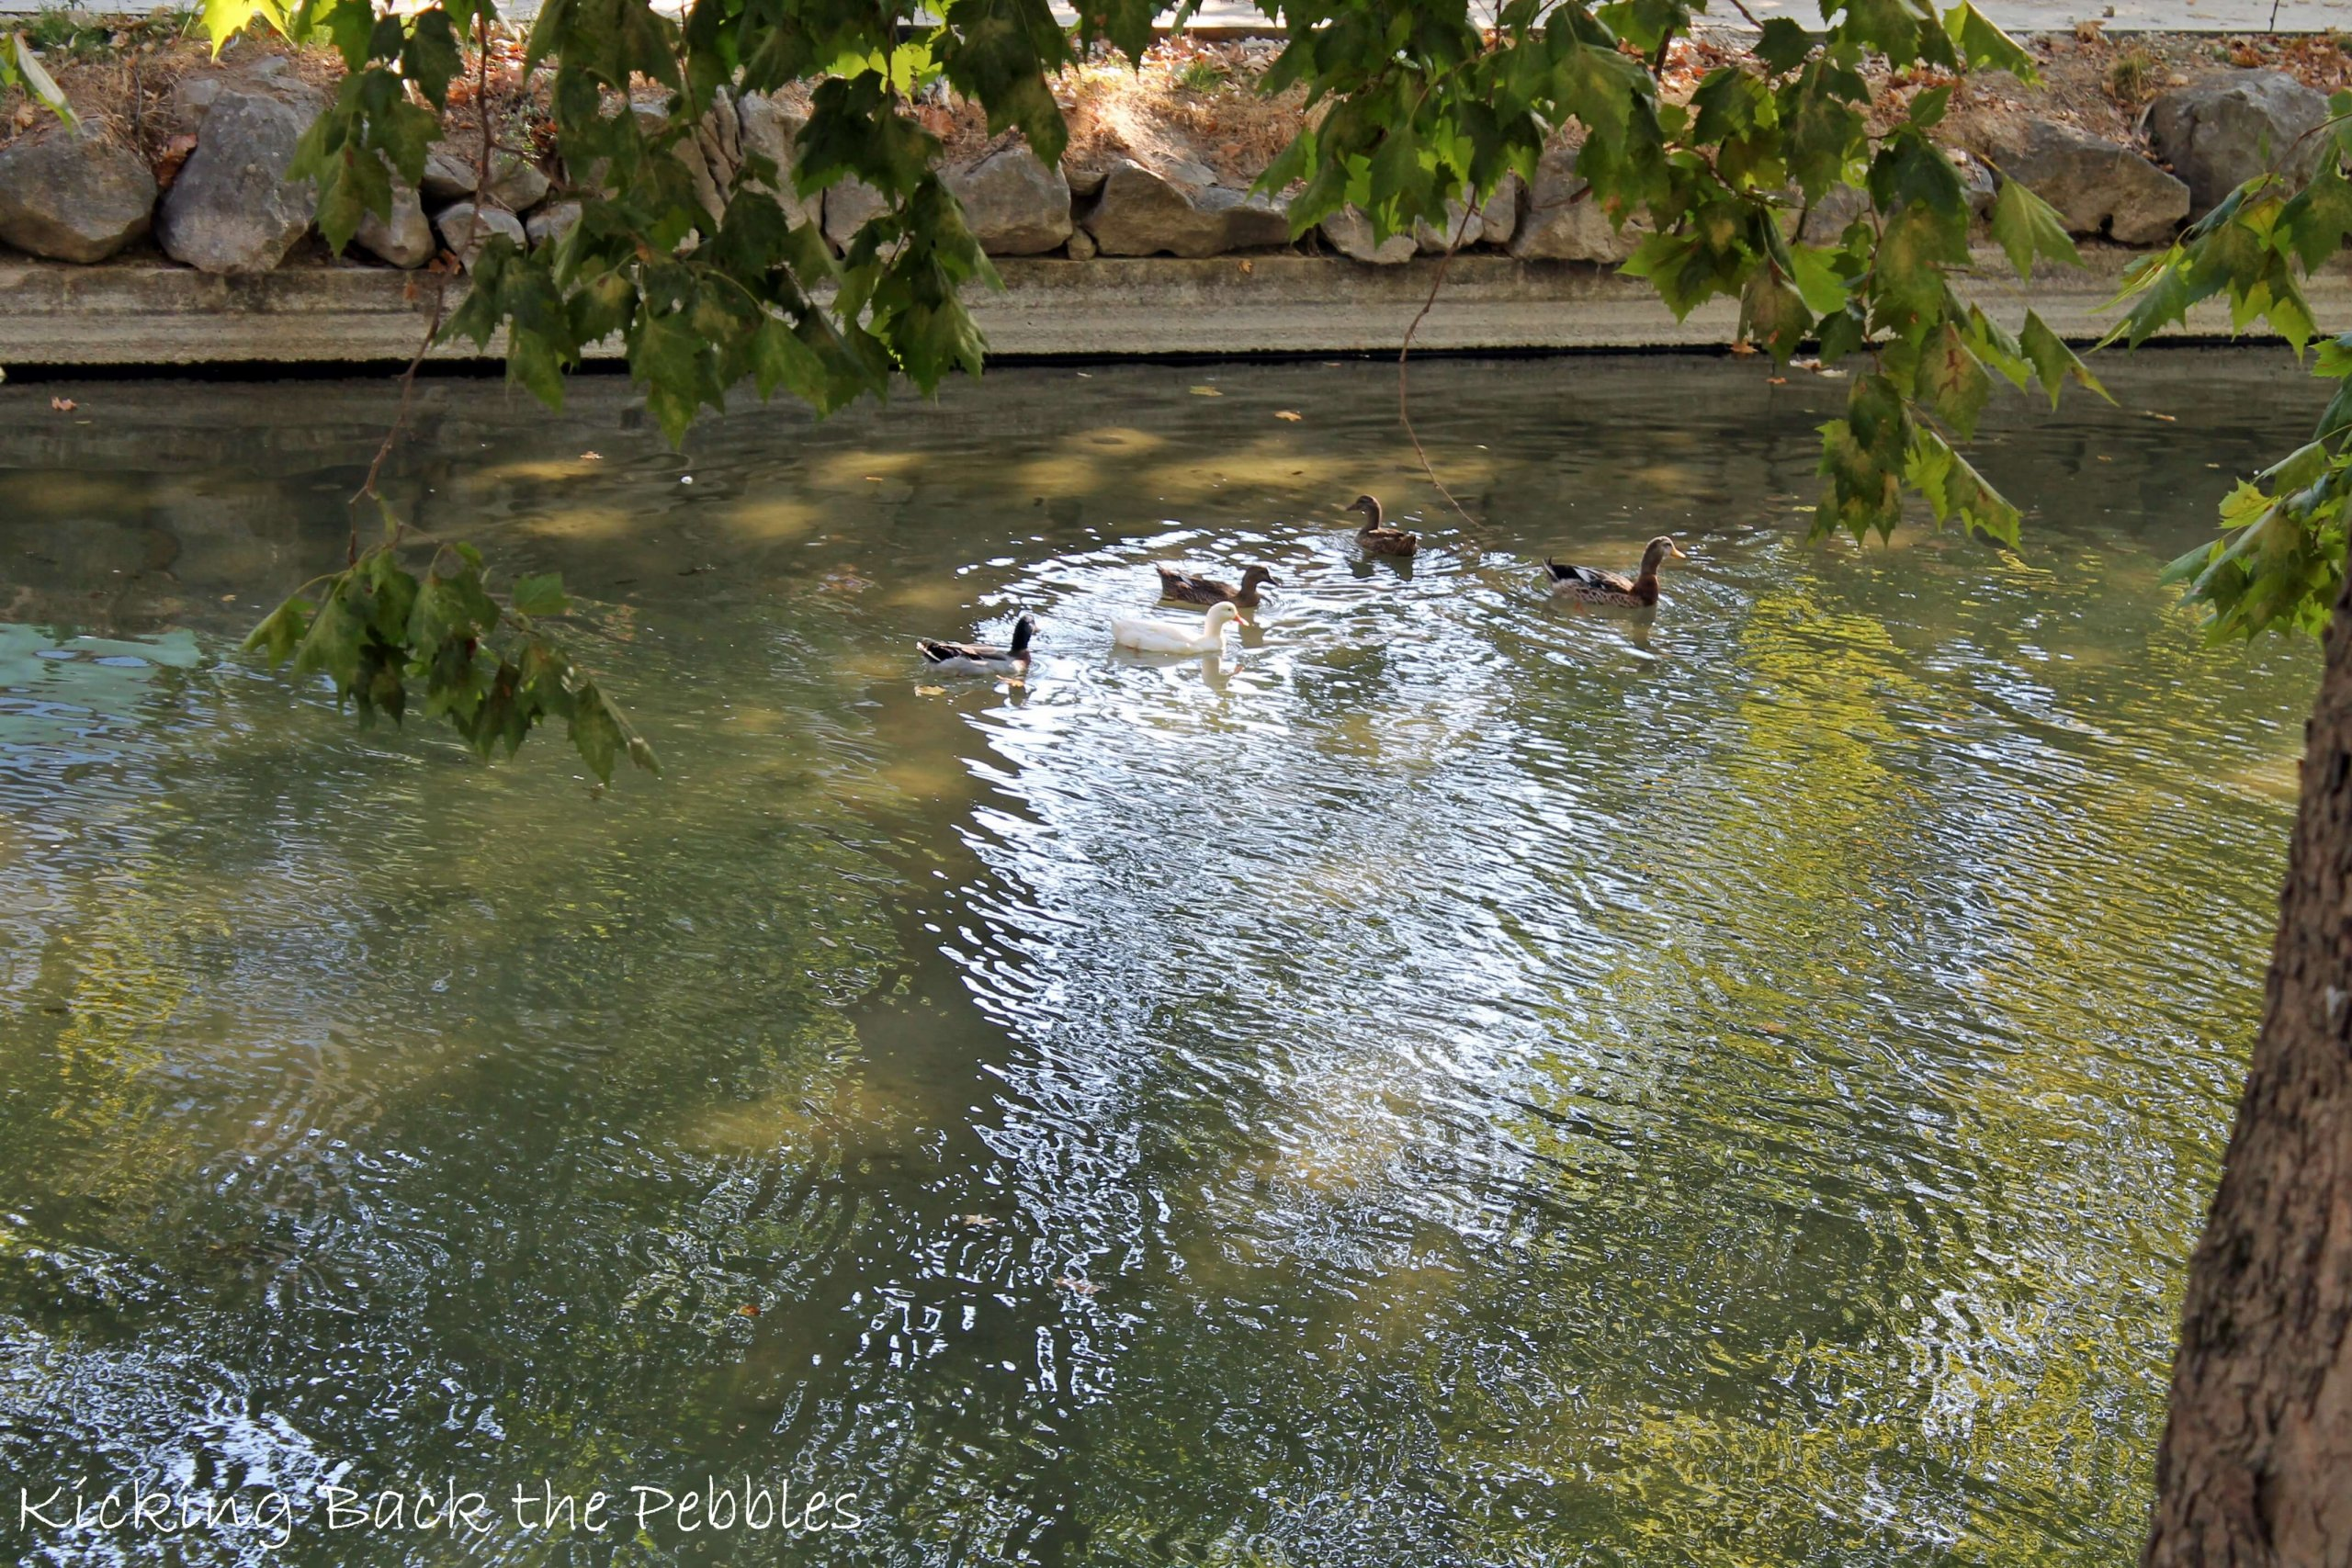 Litheos River | Kicking Back the Pebbles